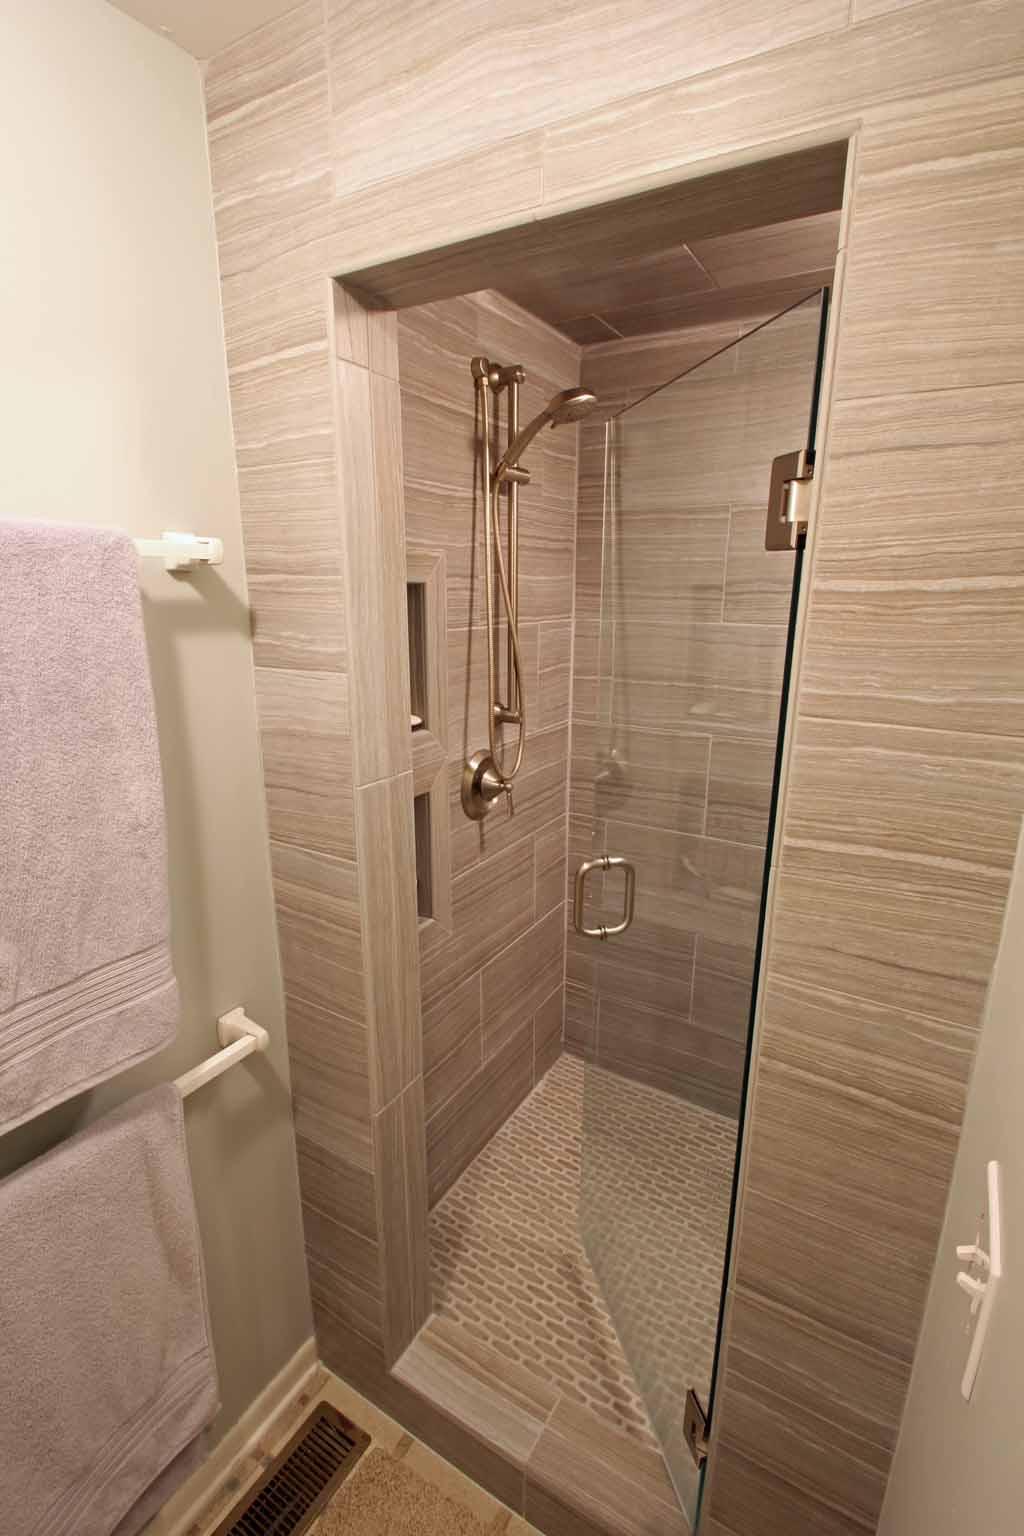 Re-tile master bath shower wand porcelain tile frameless glass door